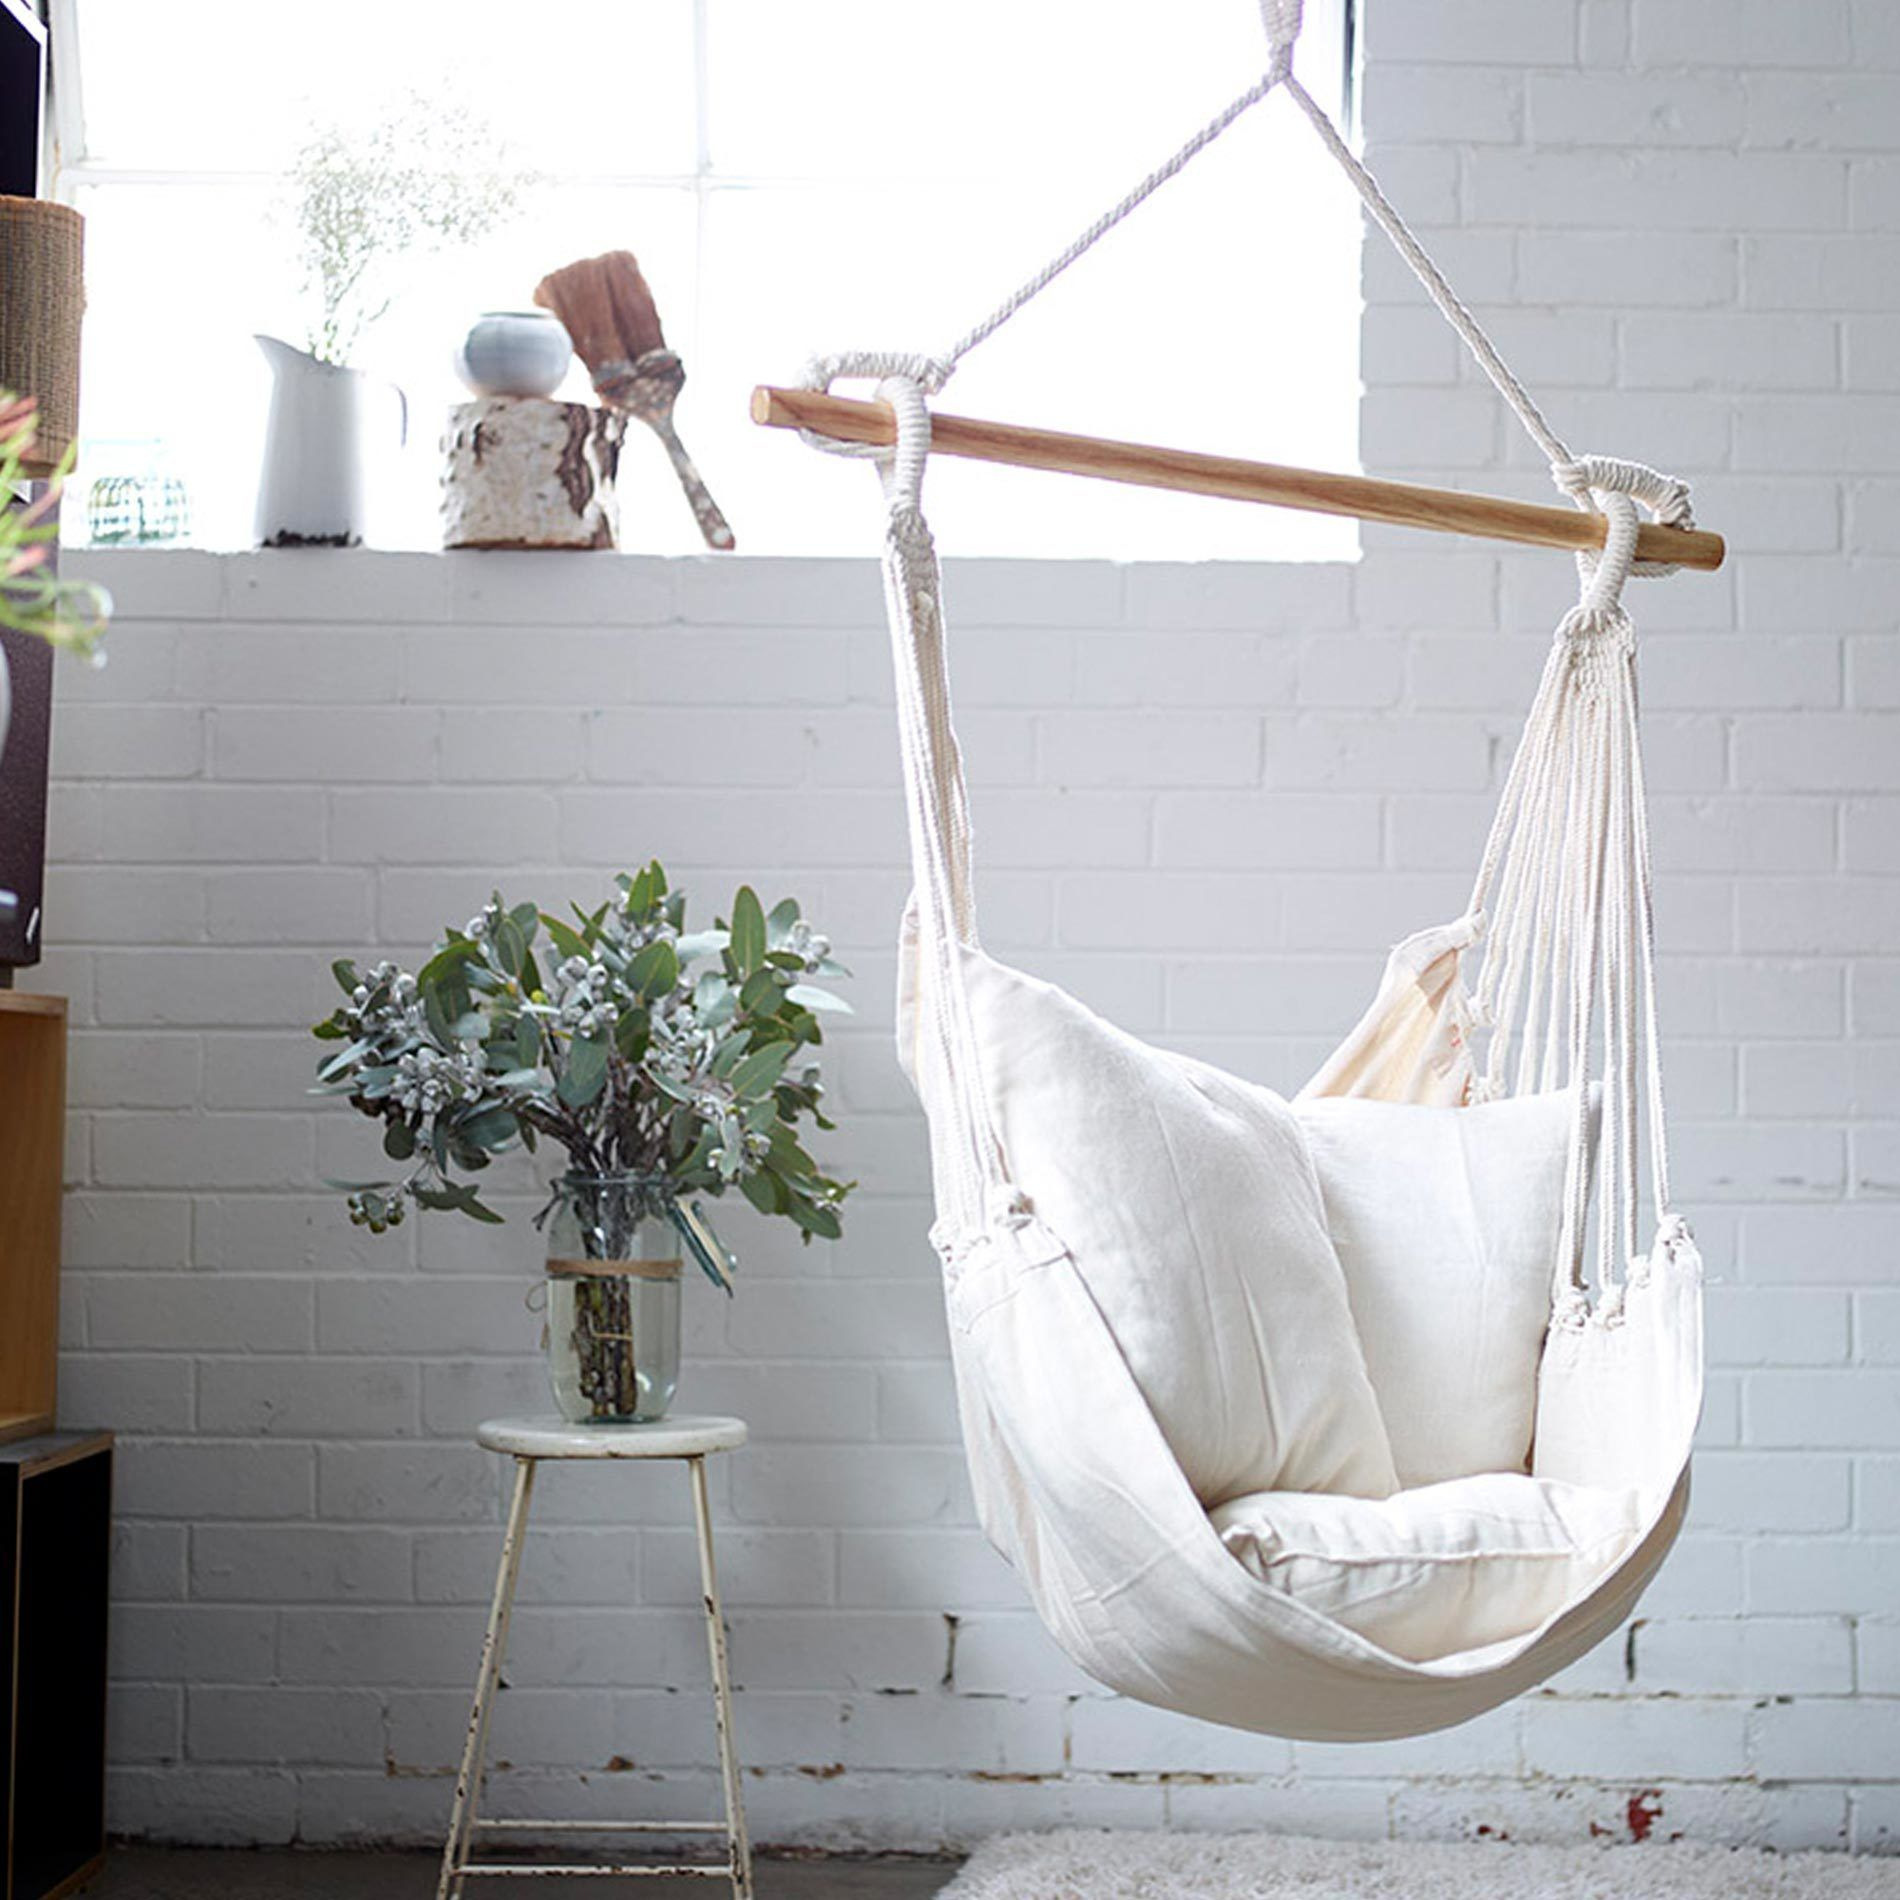 Swing Chair For Bedroom: Hanging Hammock Chair, Hammock Swing Chair